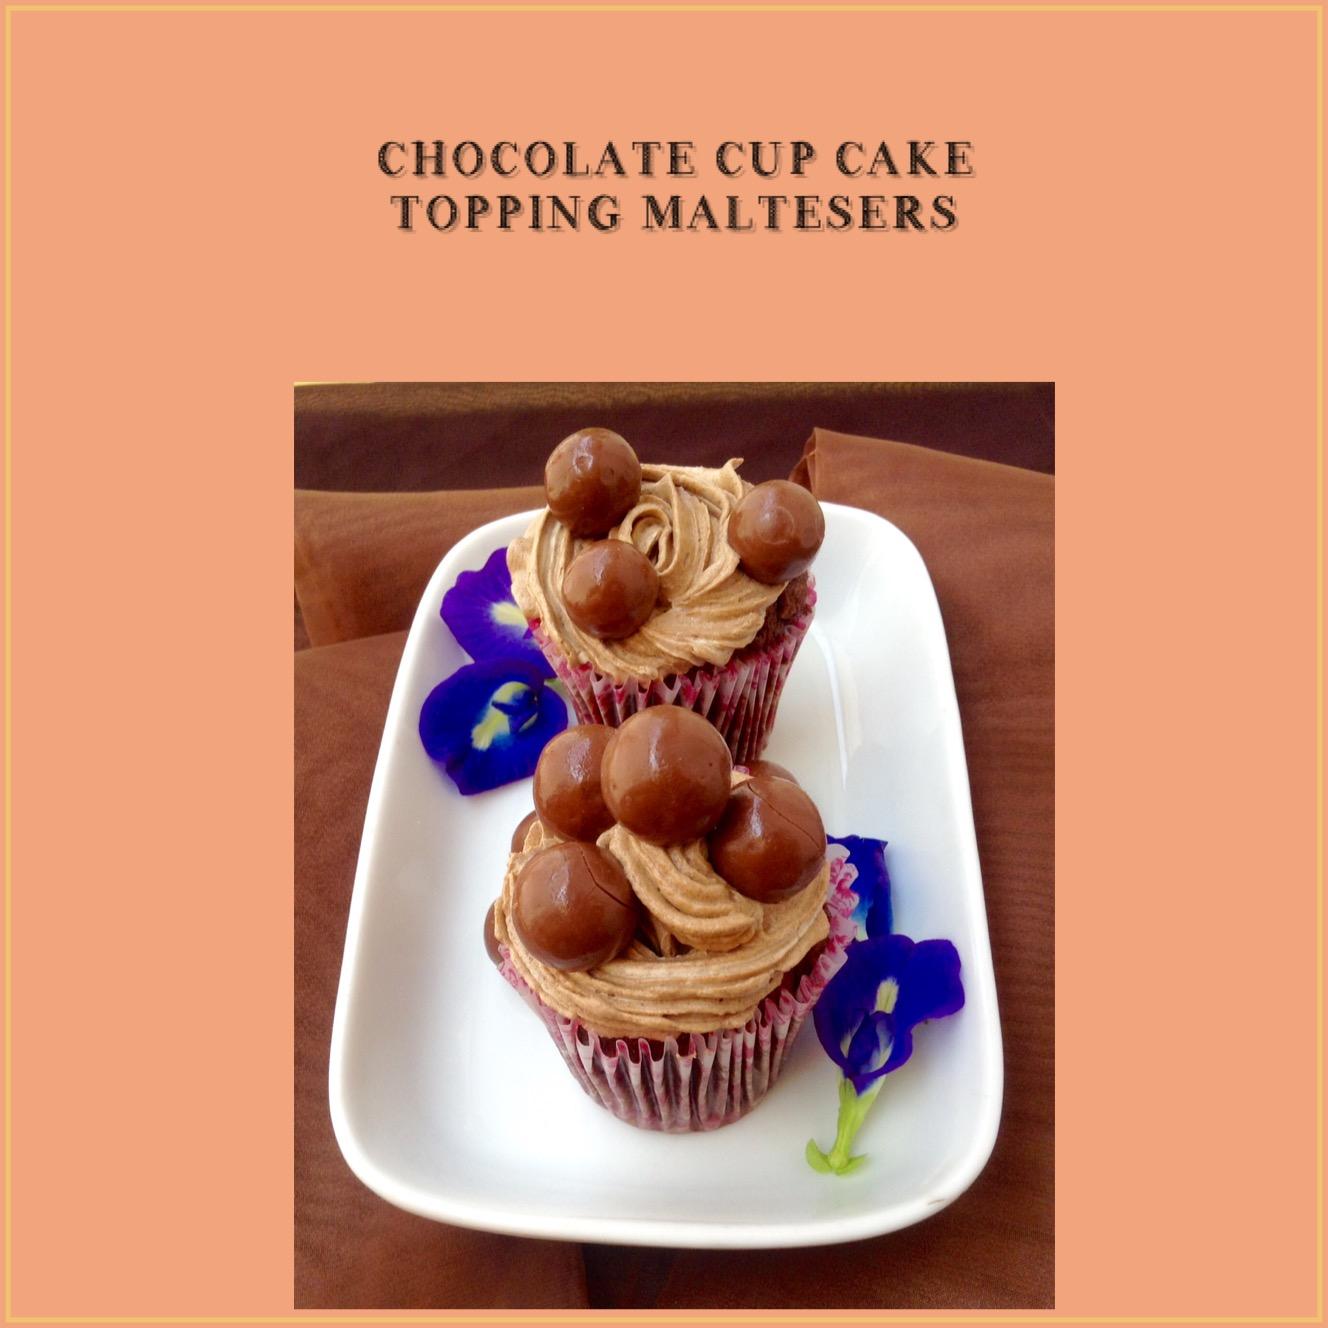 Resep Chocolate Cupcake Topping Maltesers